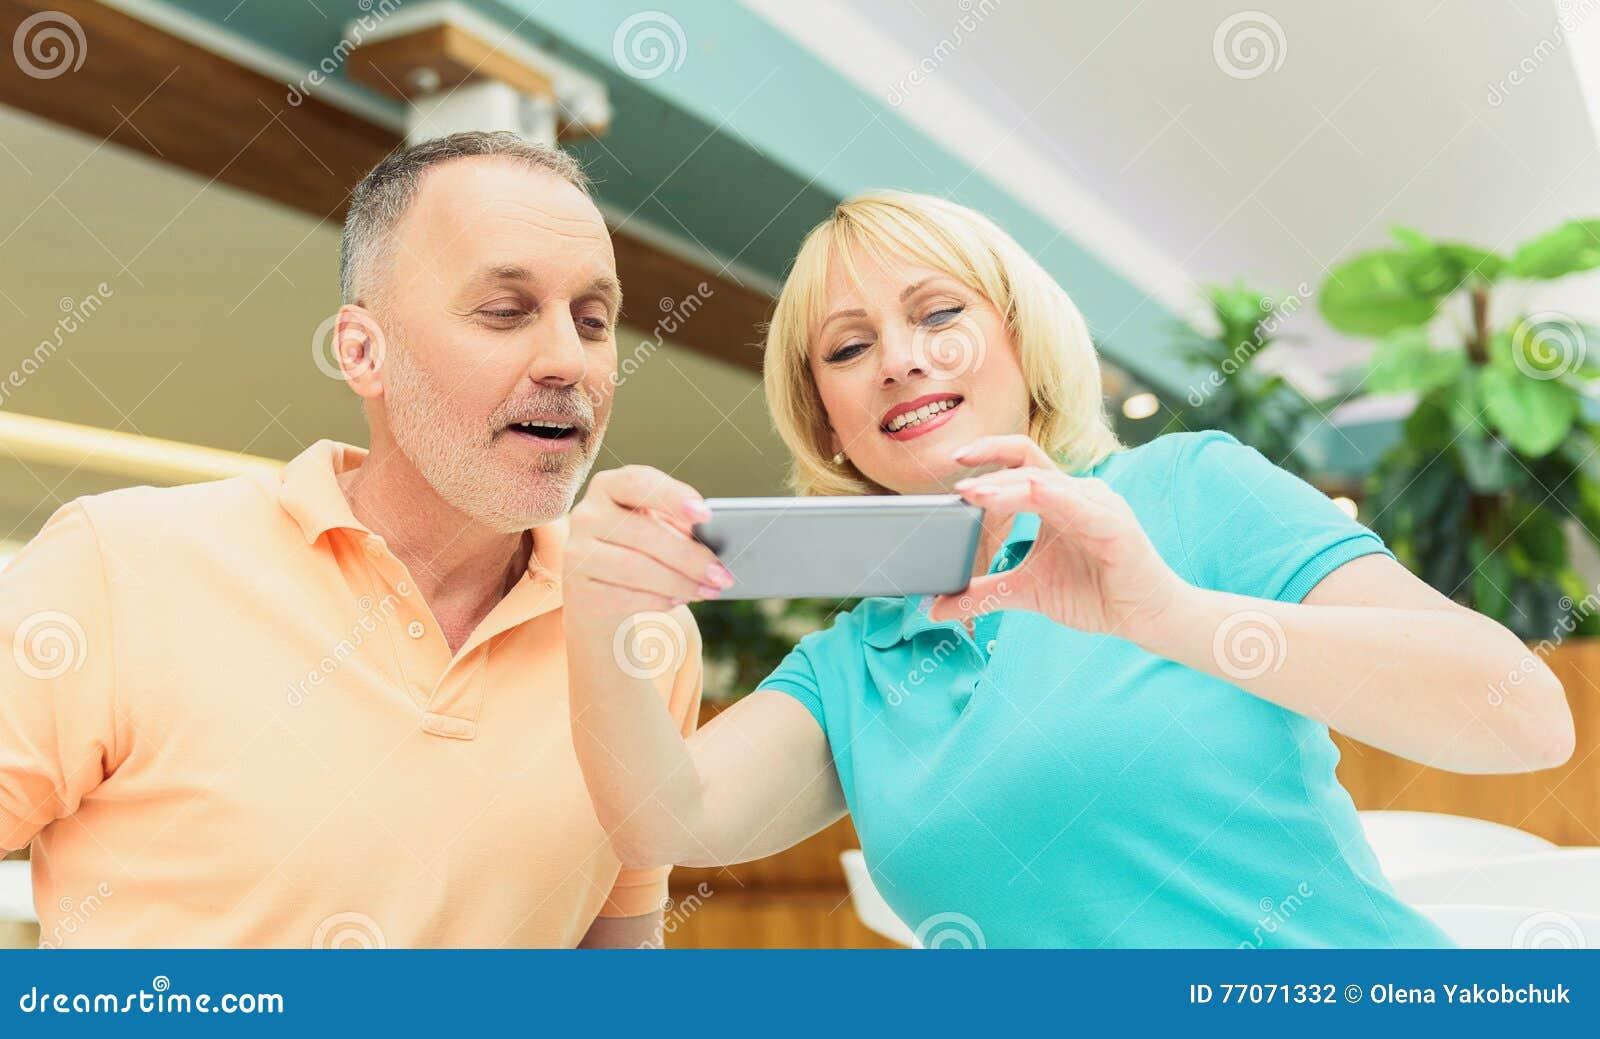 Amature Husband And Wife